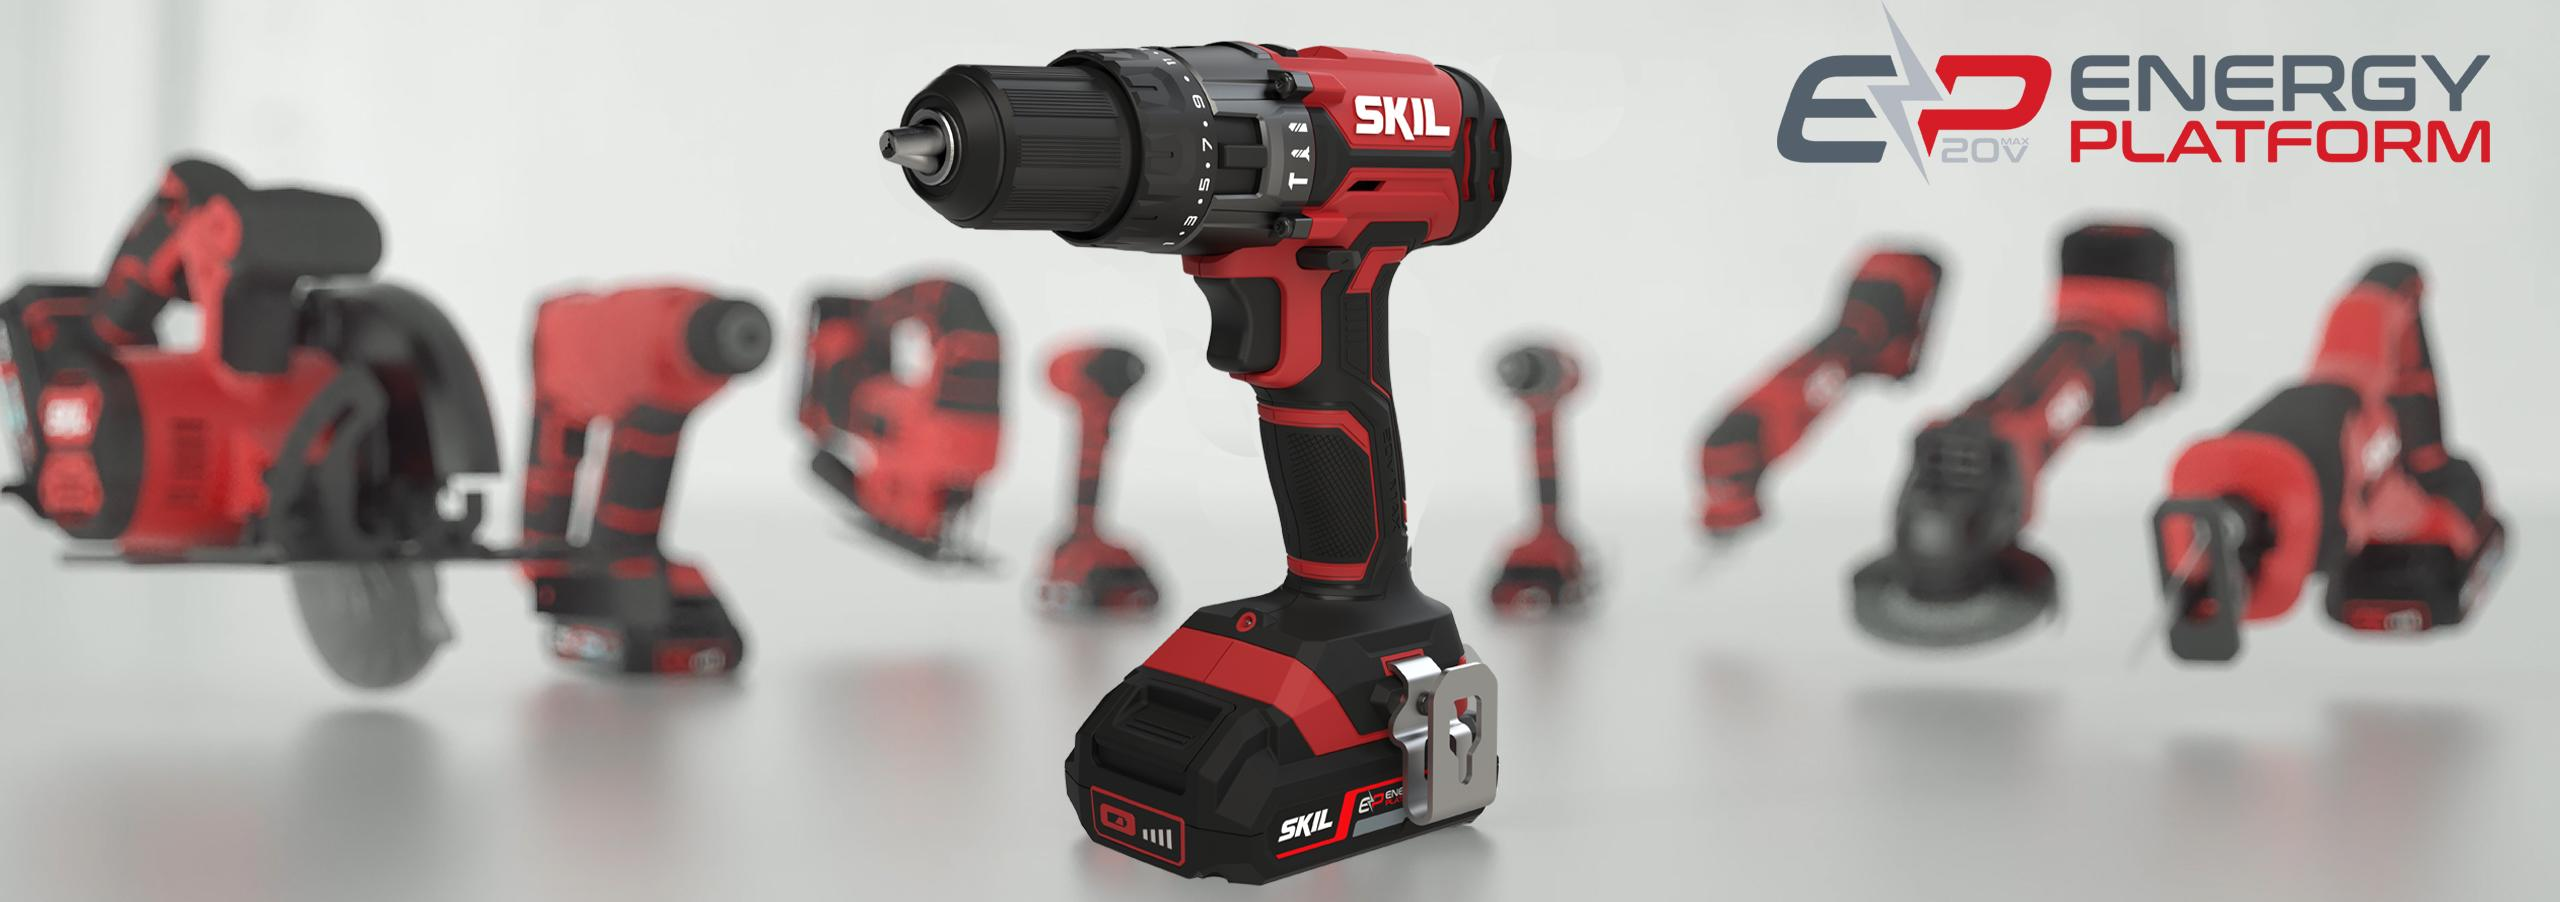 SKIL presents...